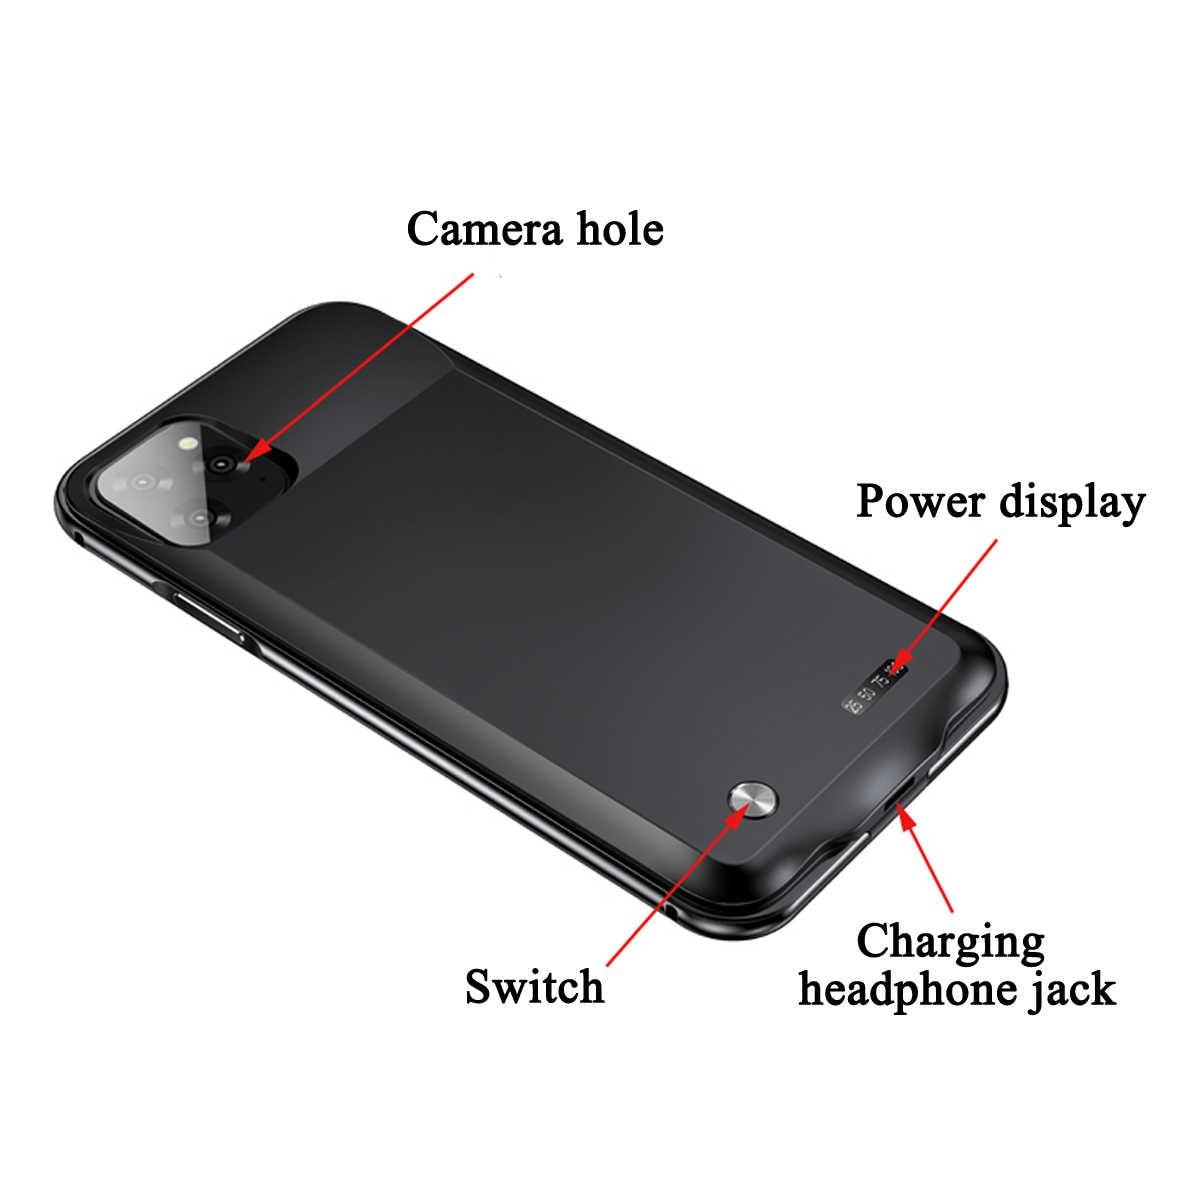 LEORY 5000mAh قوة البنك غطاء رقيقة الهاتف شحن البطارية حالة البطارية شاحن آيفون 11 6.1 ''/11pro ماكس 6.5 '/11pro 5.8''